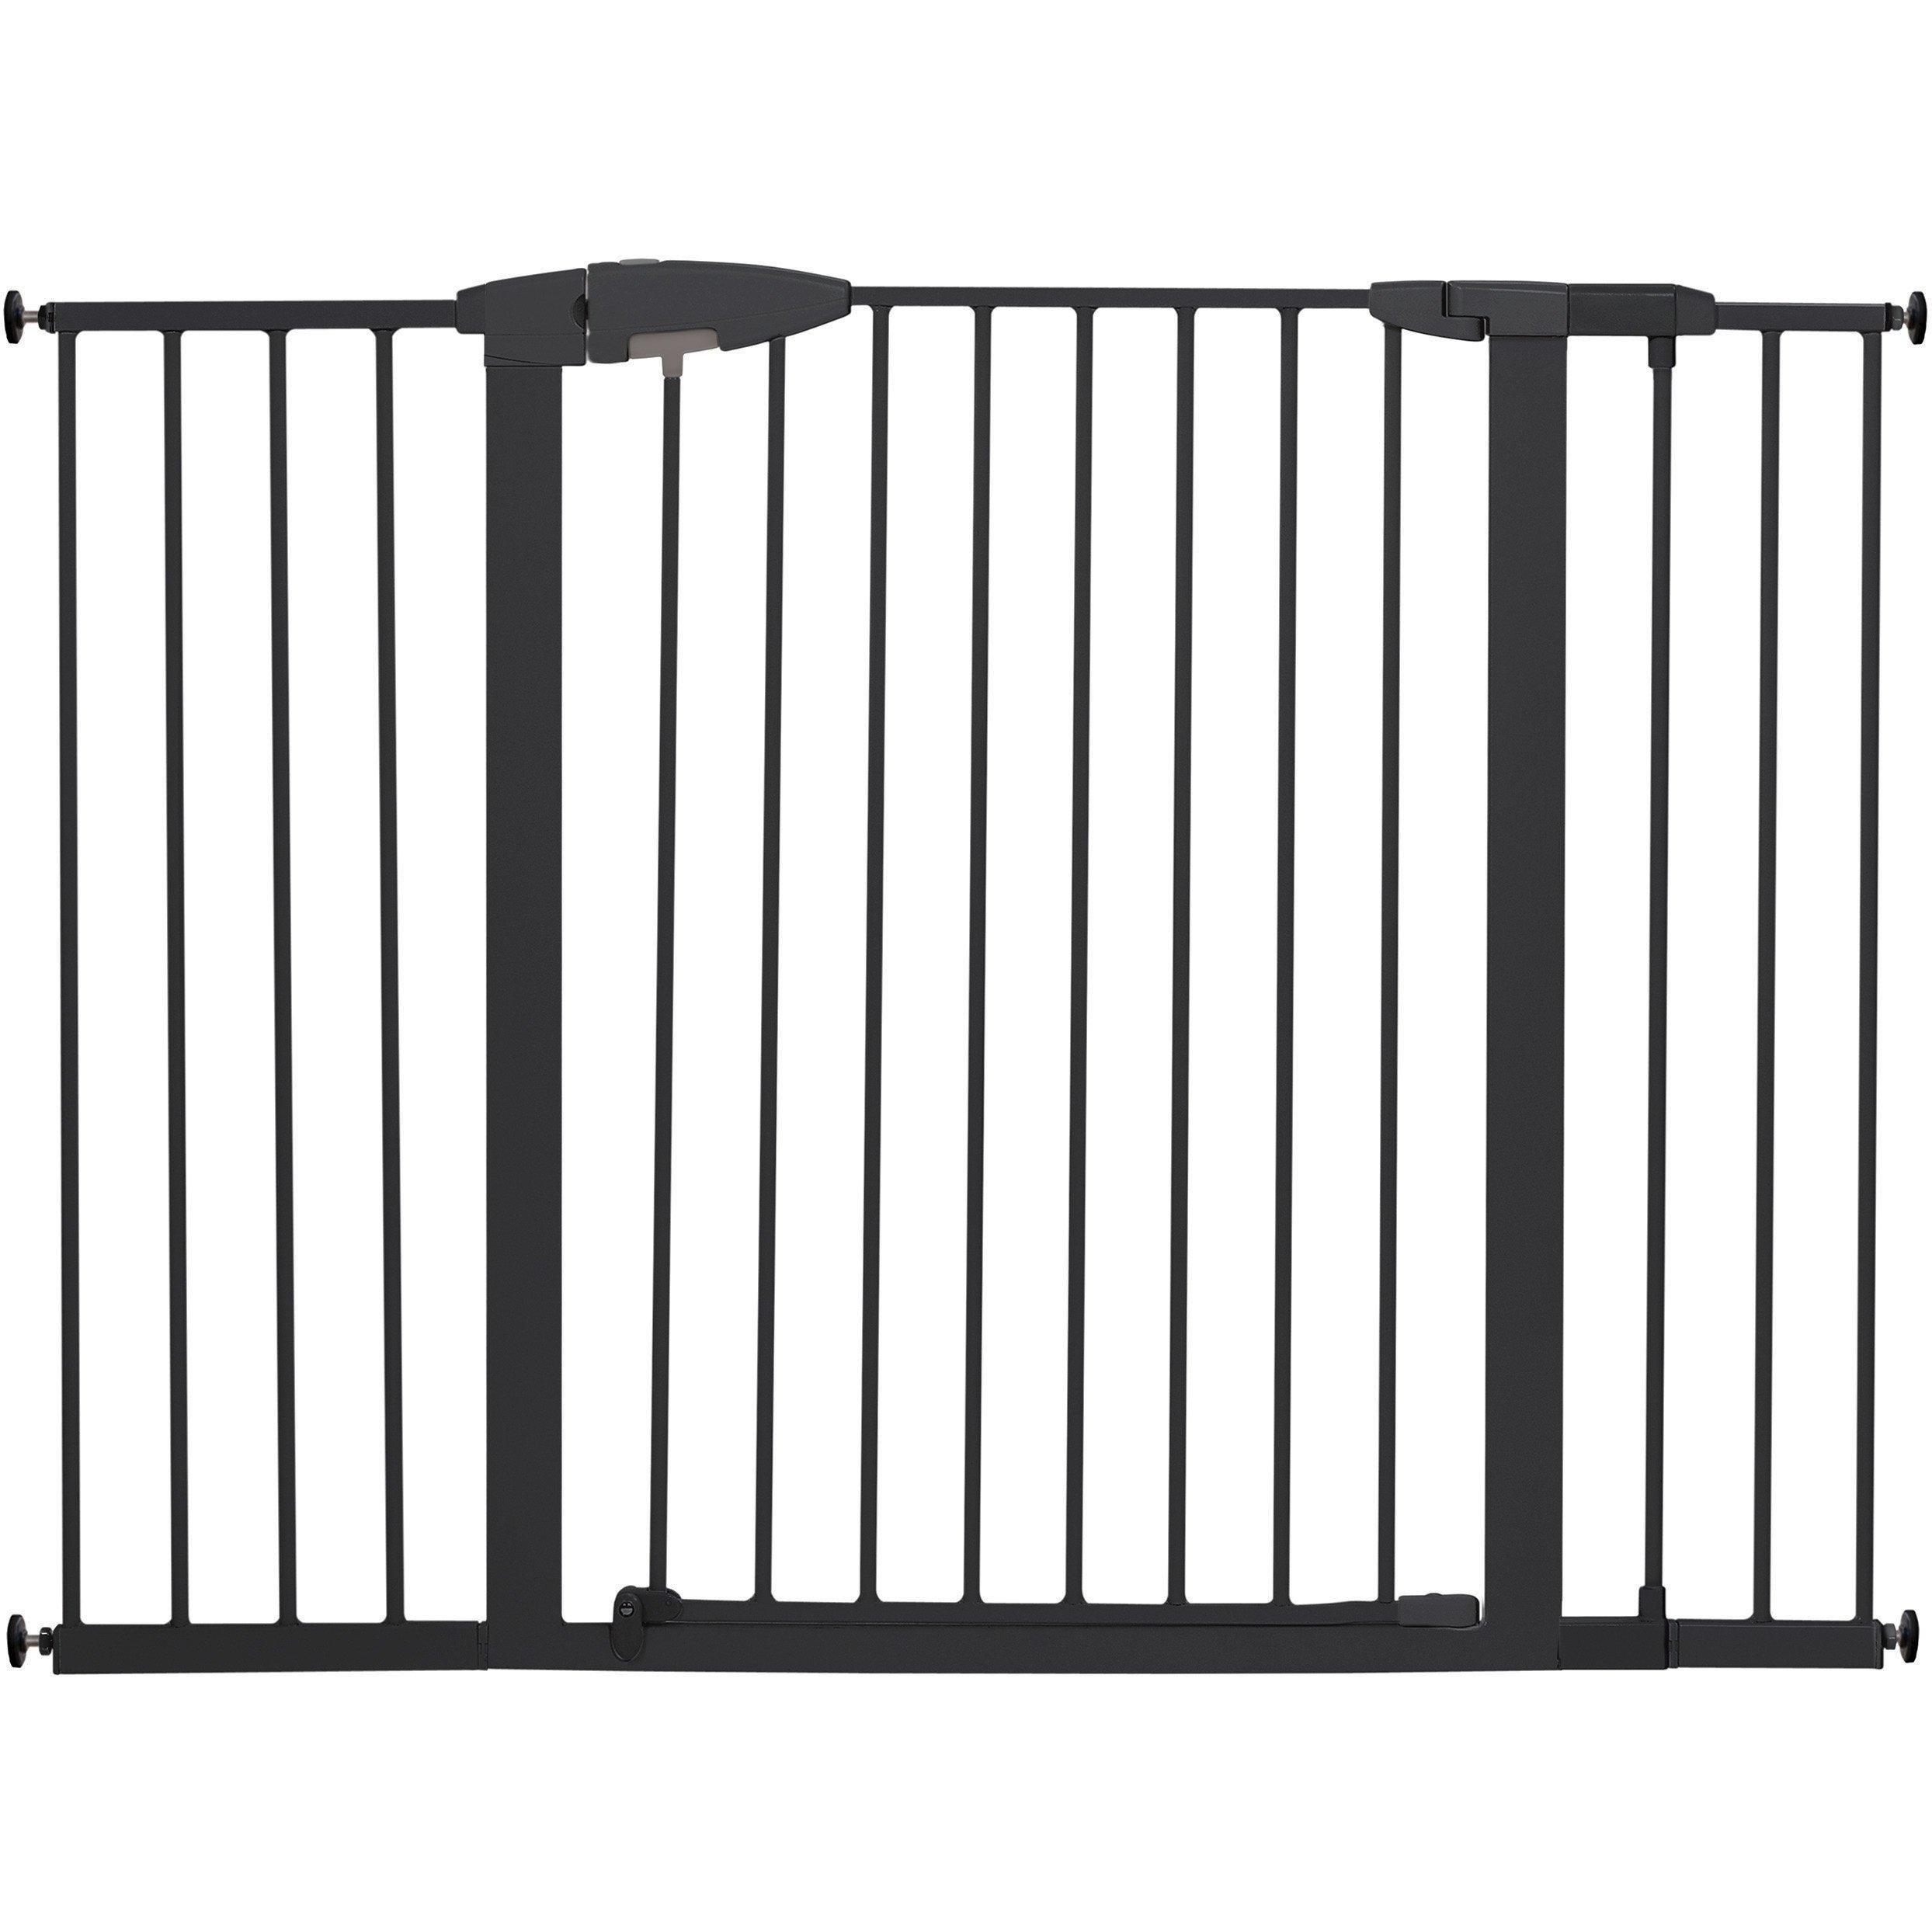 Munchkin Easy Close XL Metal Baby Gate, 29.5'' - 51.6'' Wide, Black, Model MK0009-111